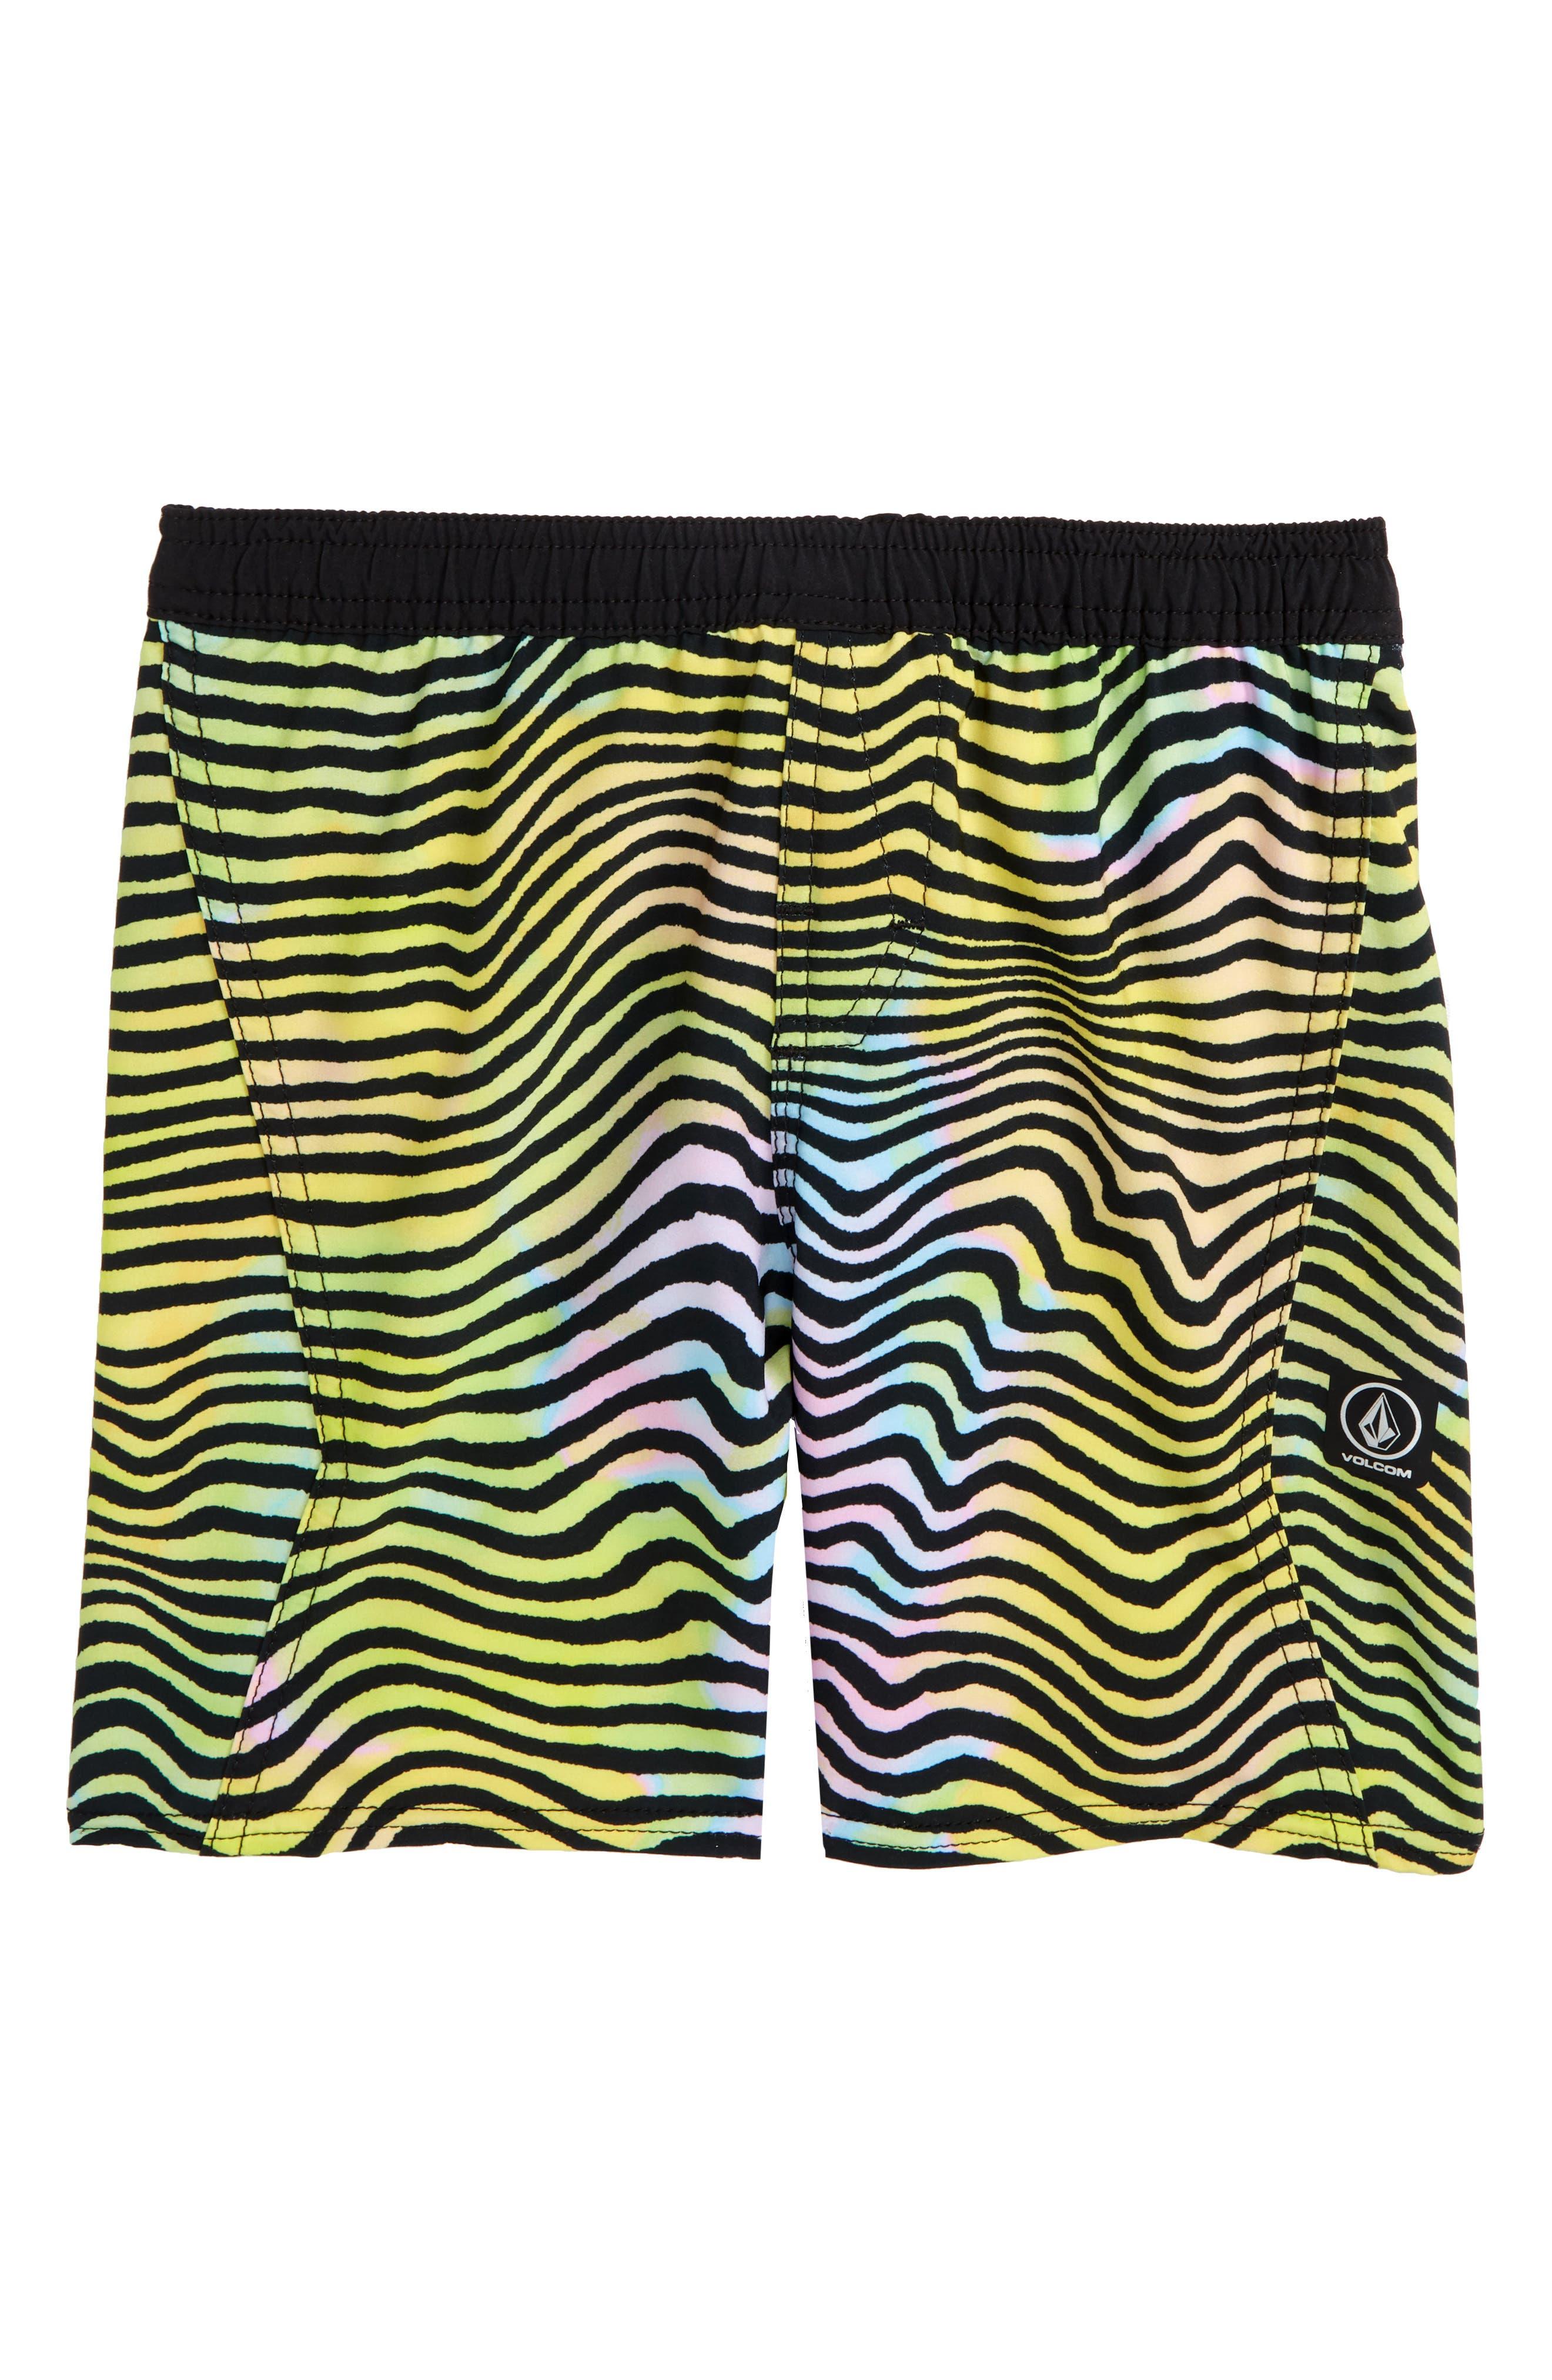 Vibes Swim Trunks,                         Main,                         color, Multi